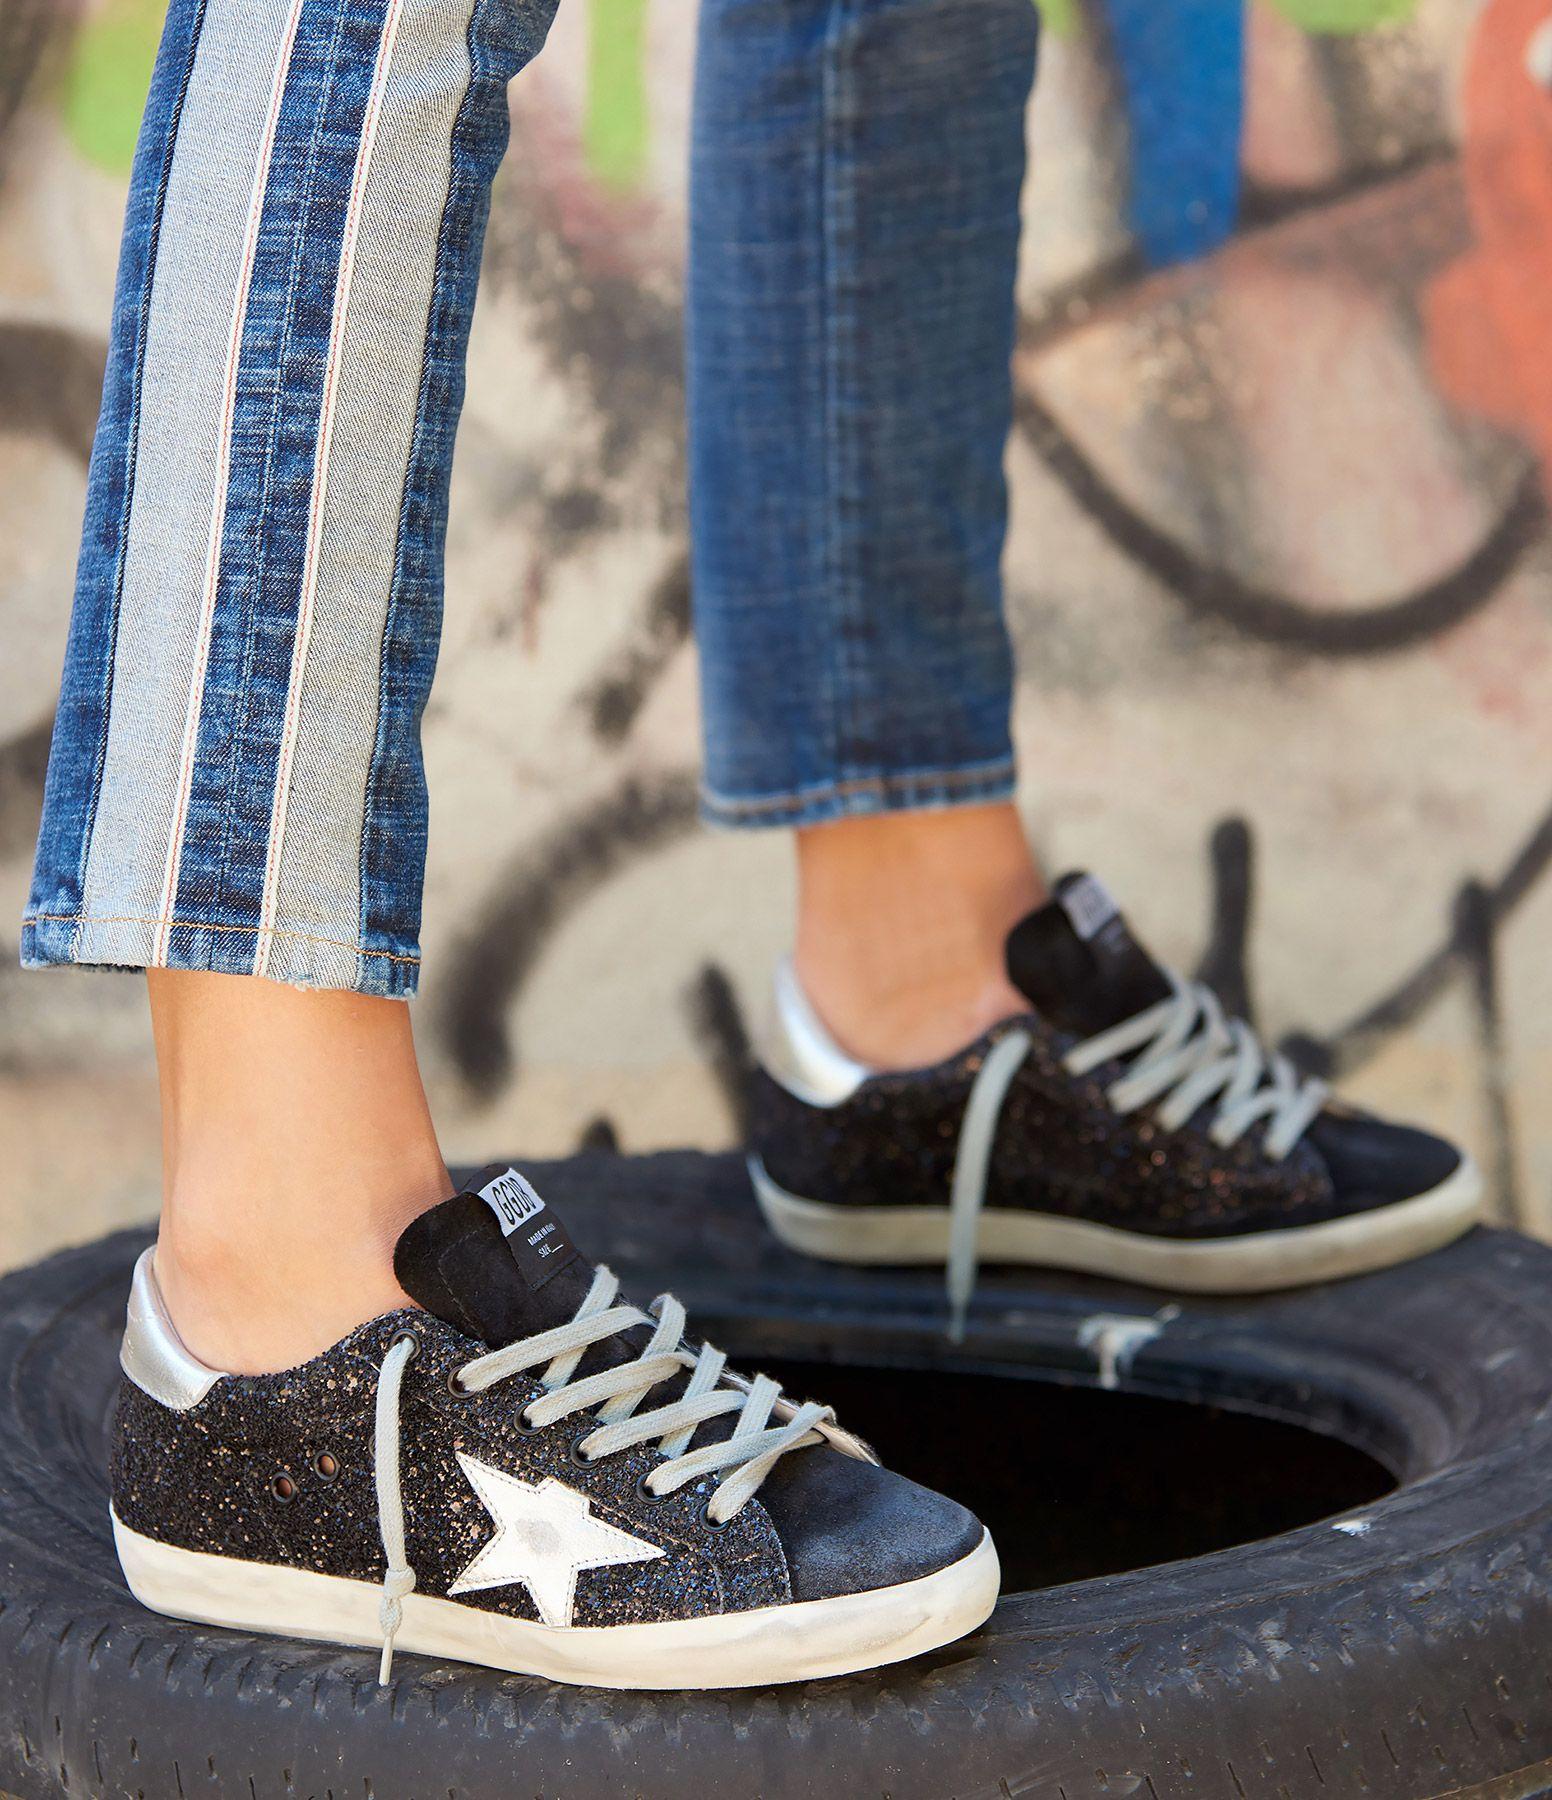 Achetez nos Adidas, Vans, Converse, Golden Goose Chaussures